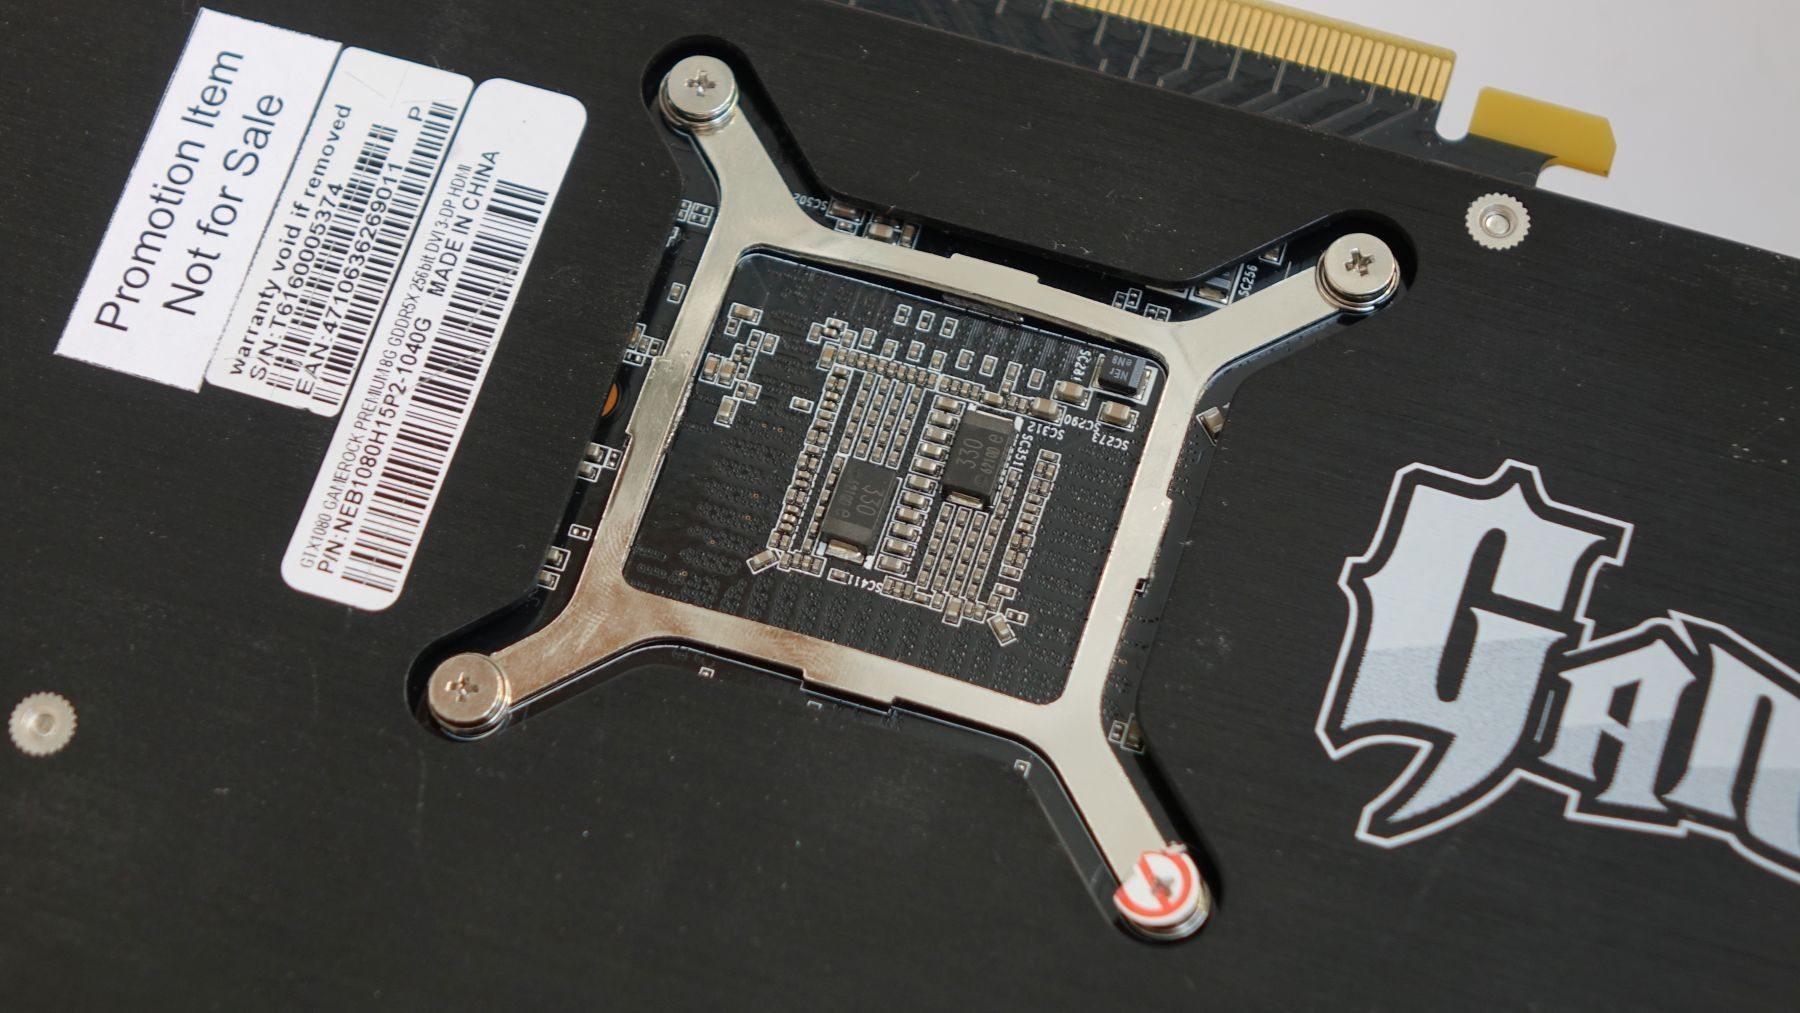 Palit GeForce GTX 1080 GameRock Premium Edition gpu